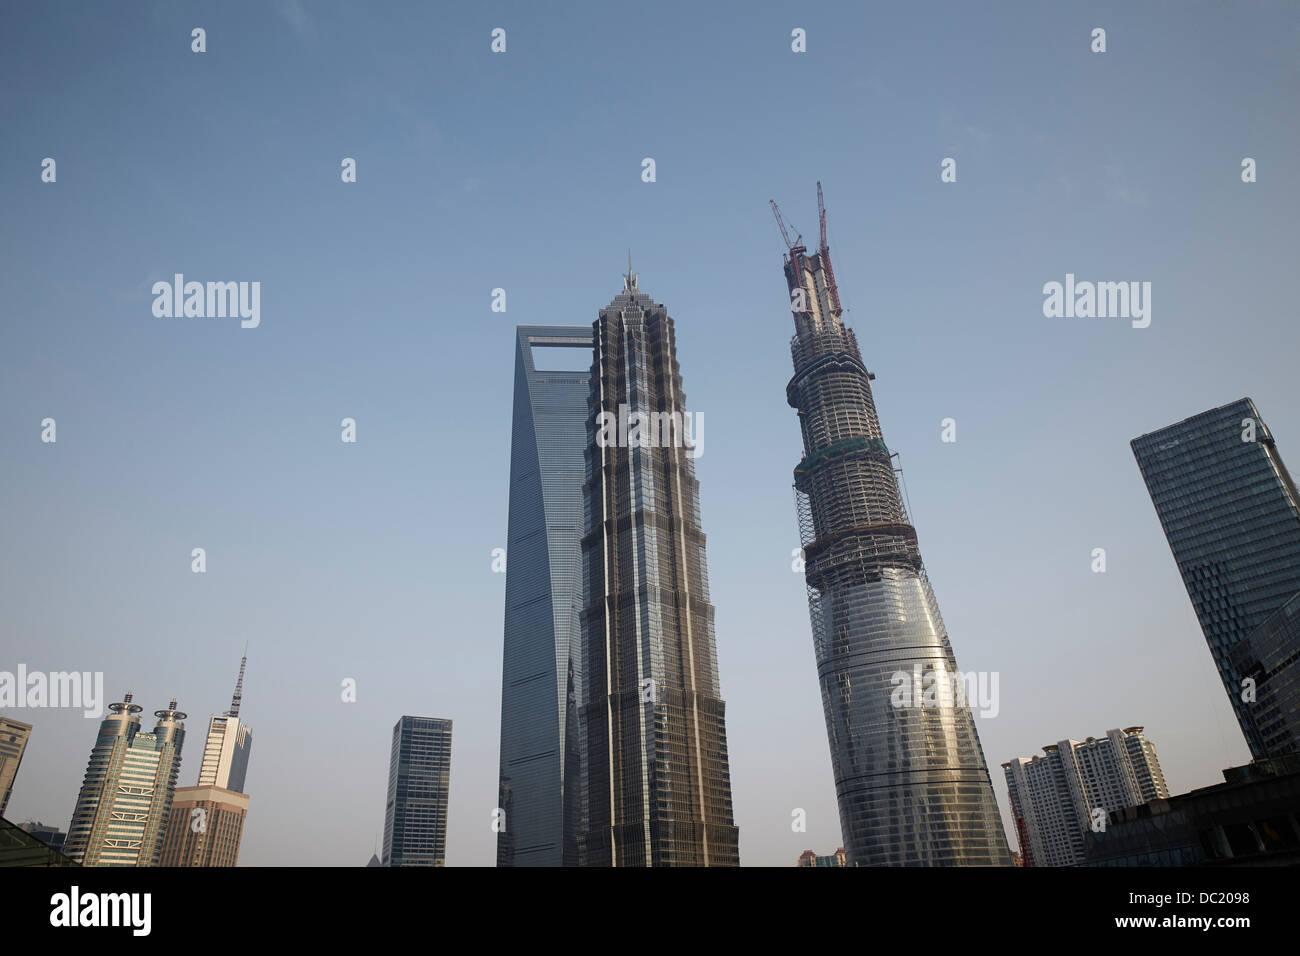 Shanghai Tower, Torre di Jin Mao e Shanghai World Financial Center di Shanghai, Cina Immagini Stock